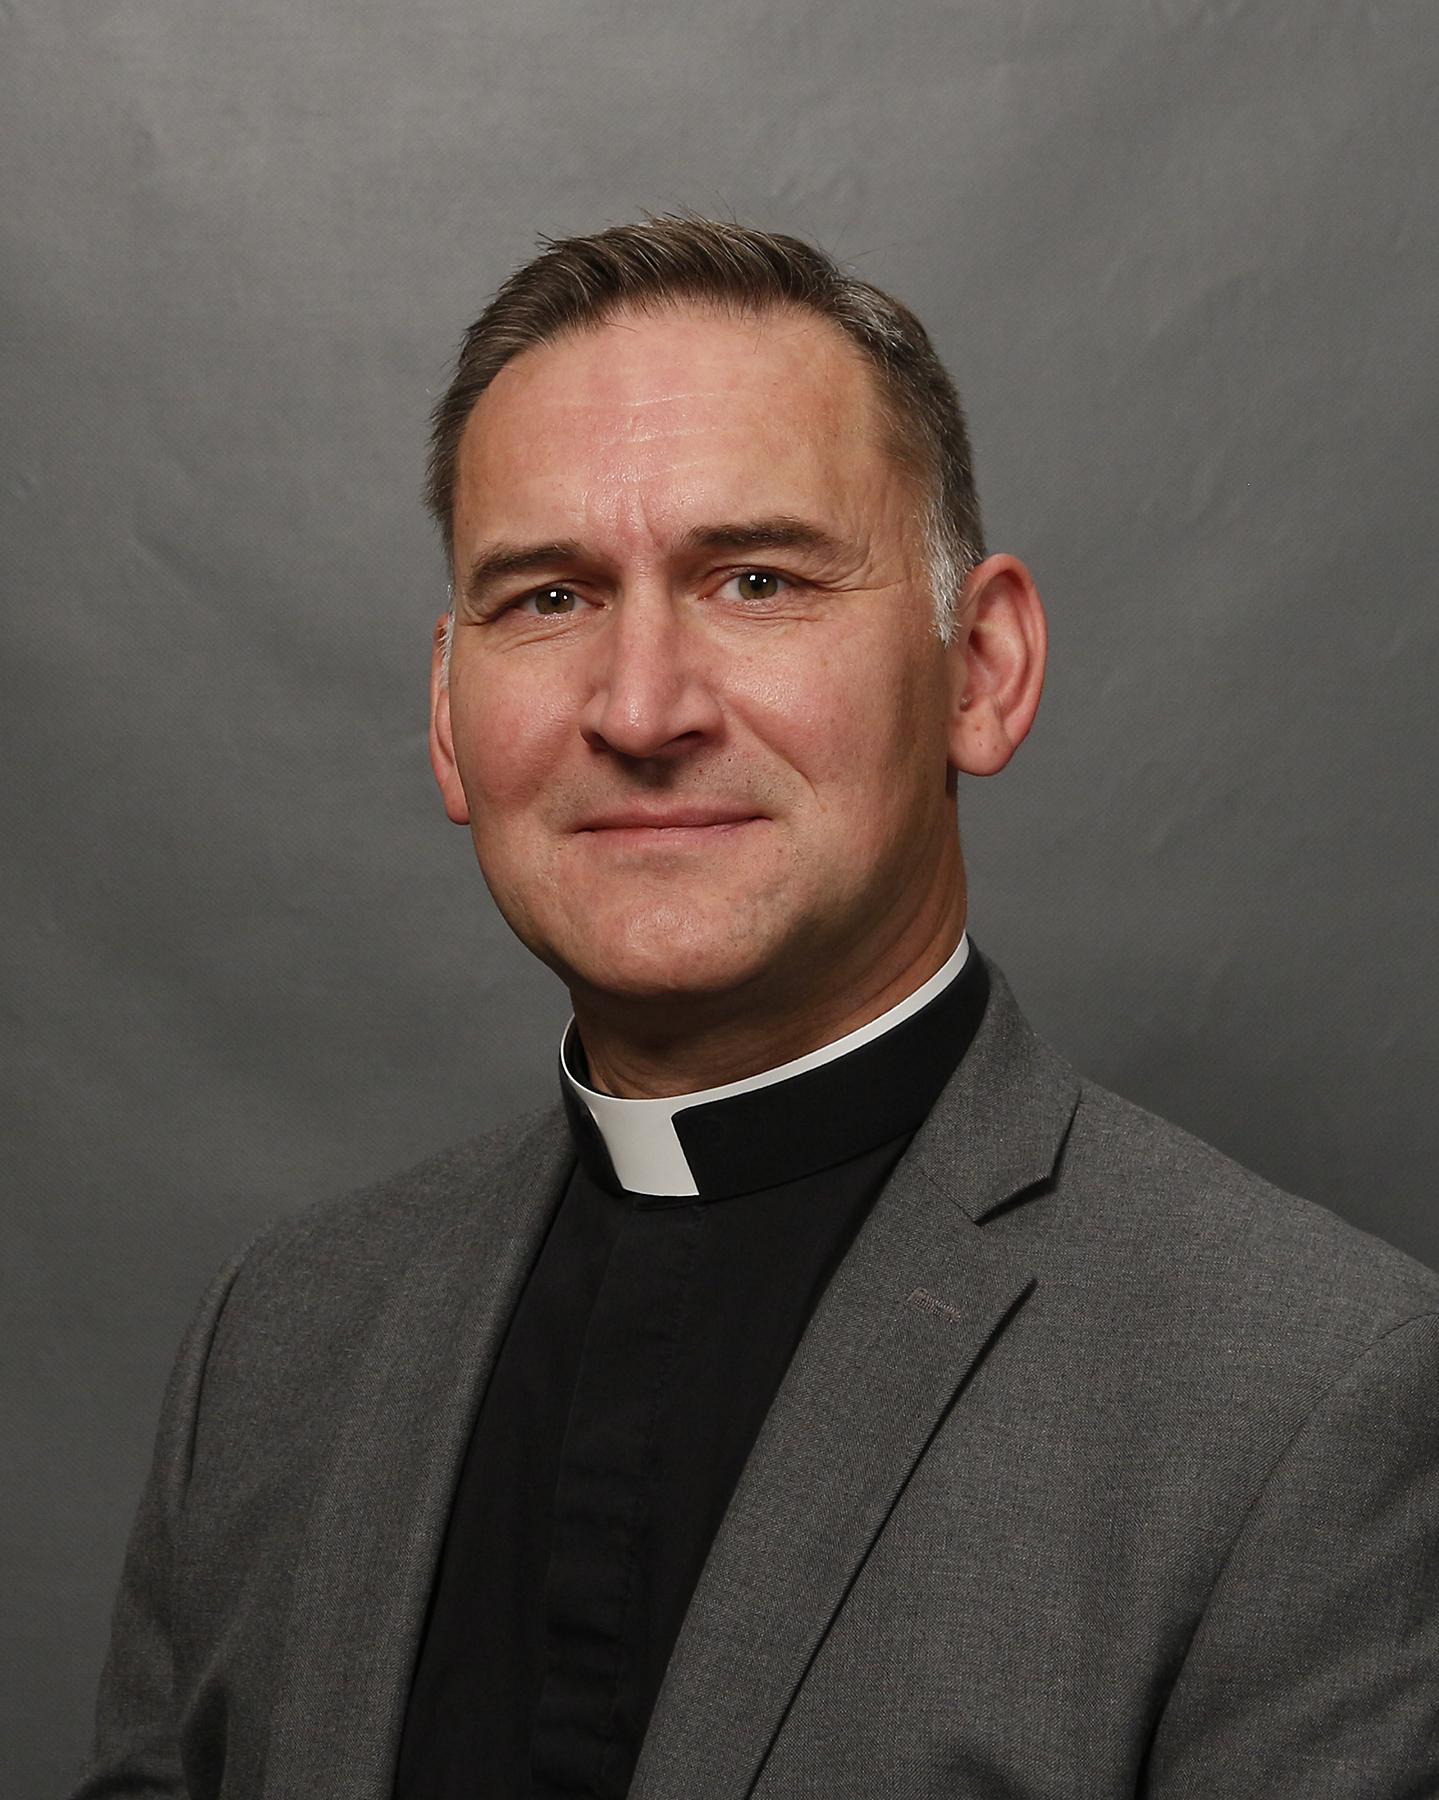 Rev. Chad Schopp